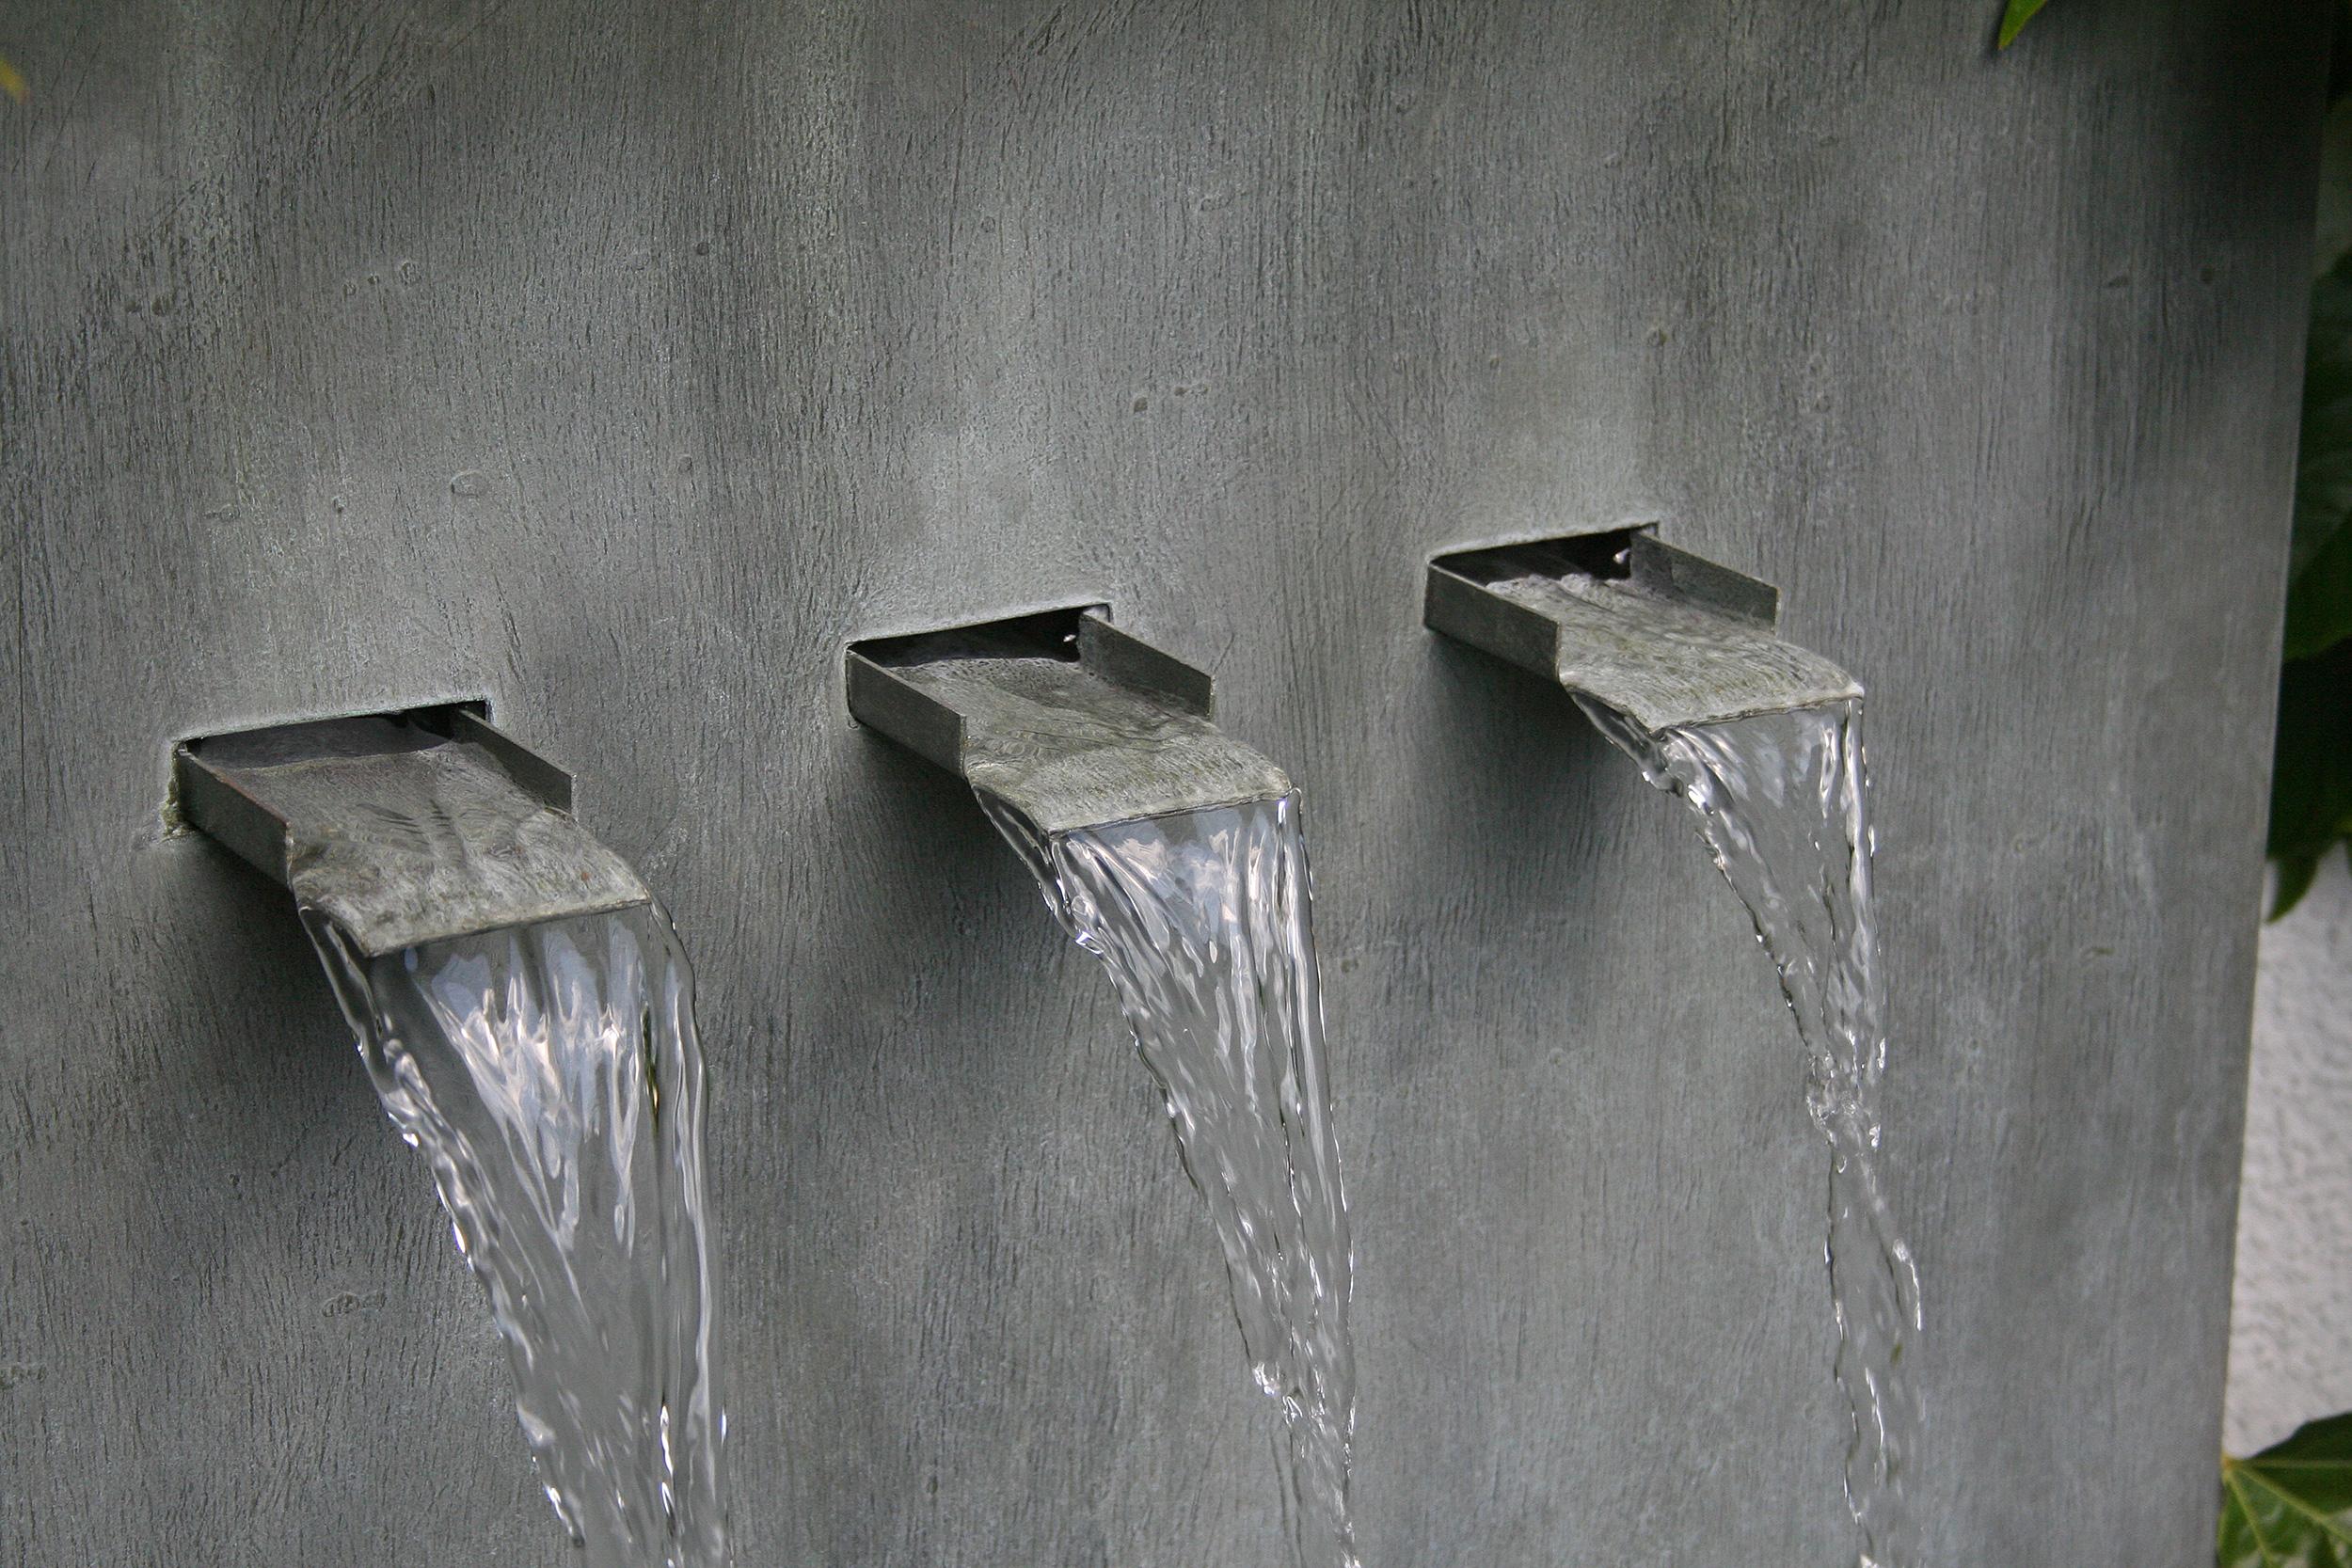 Wandbrunnen Wasserfall Wand Zinkart Wall 3 Gardomat